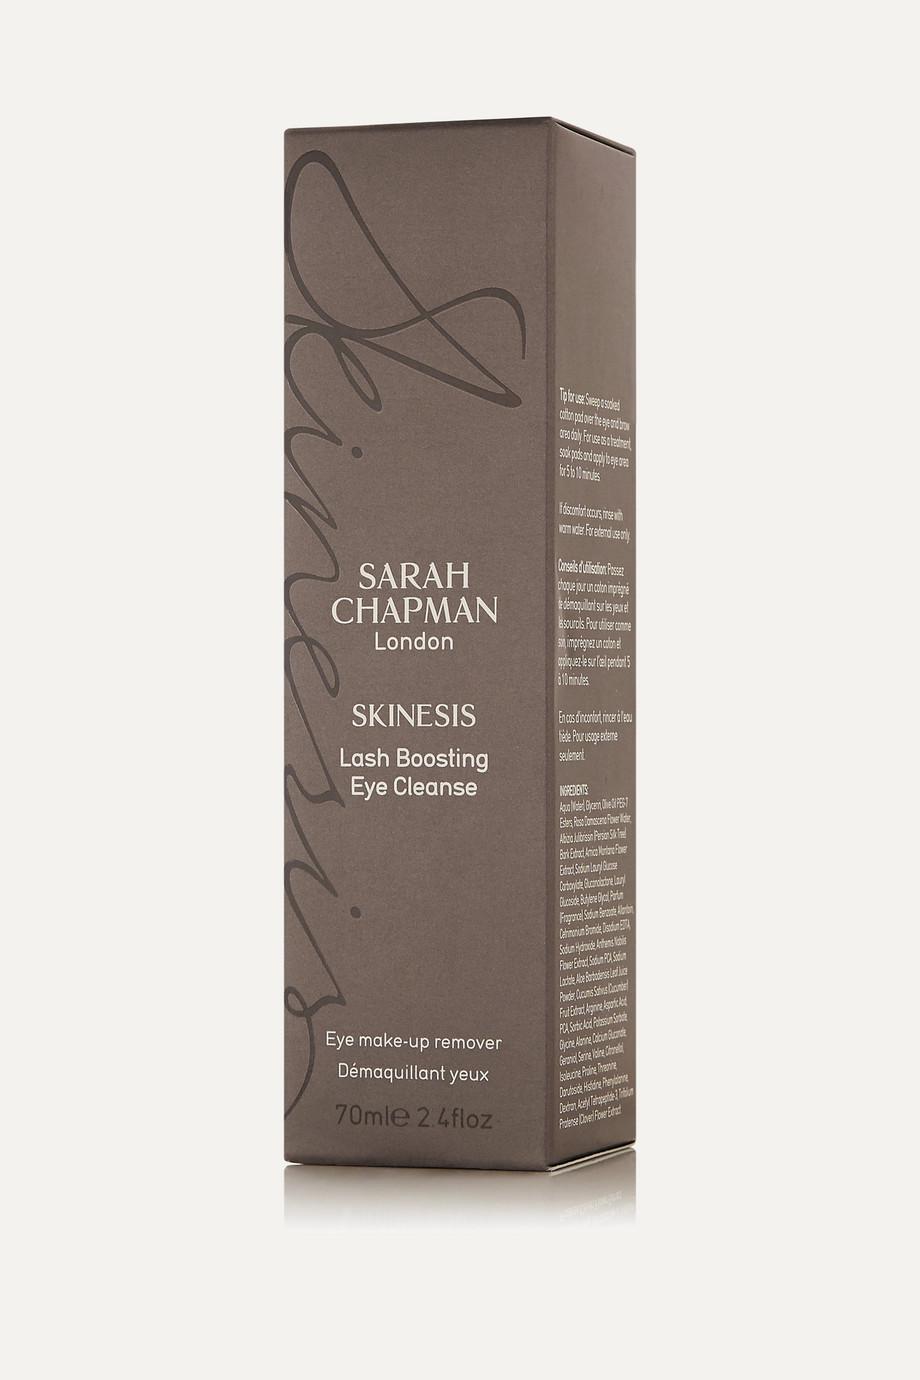 Sarah Chapman Skinesis Lash Boosting Eye Cleanse, 70ml